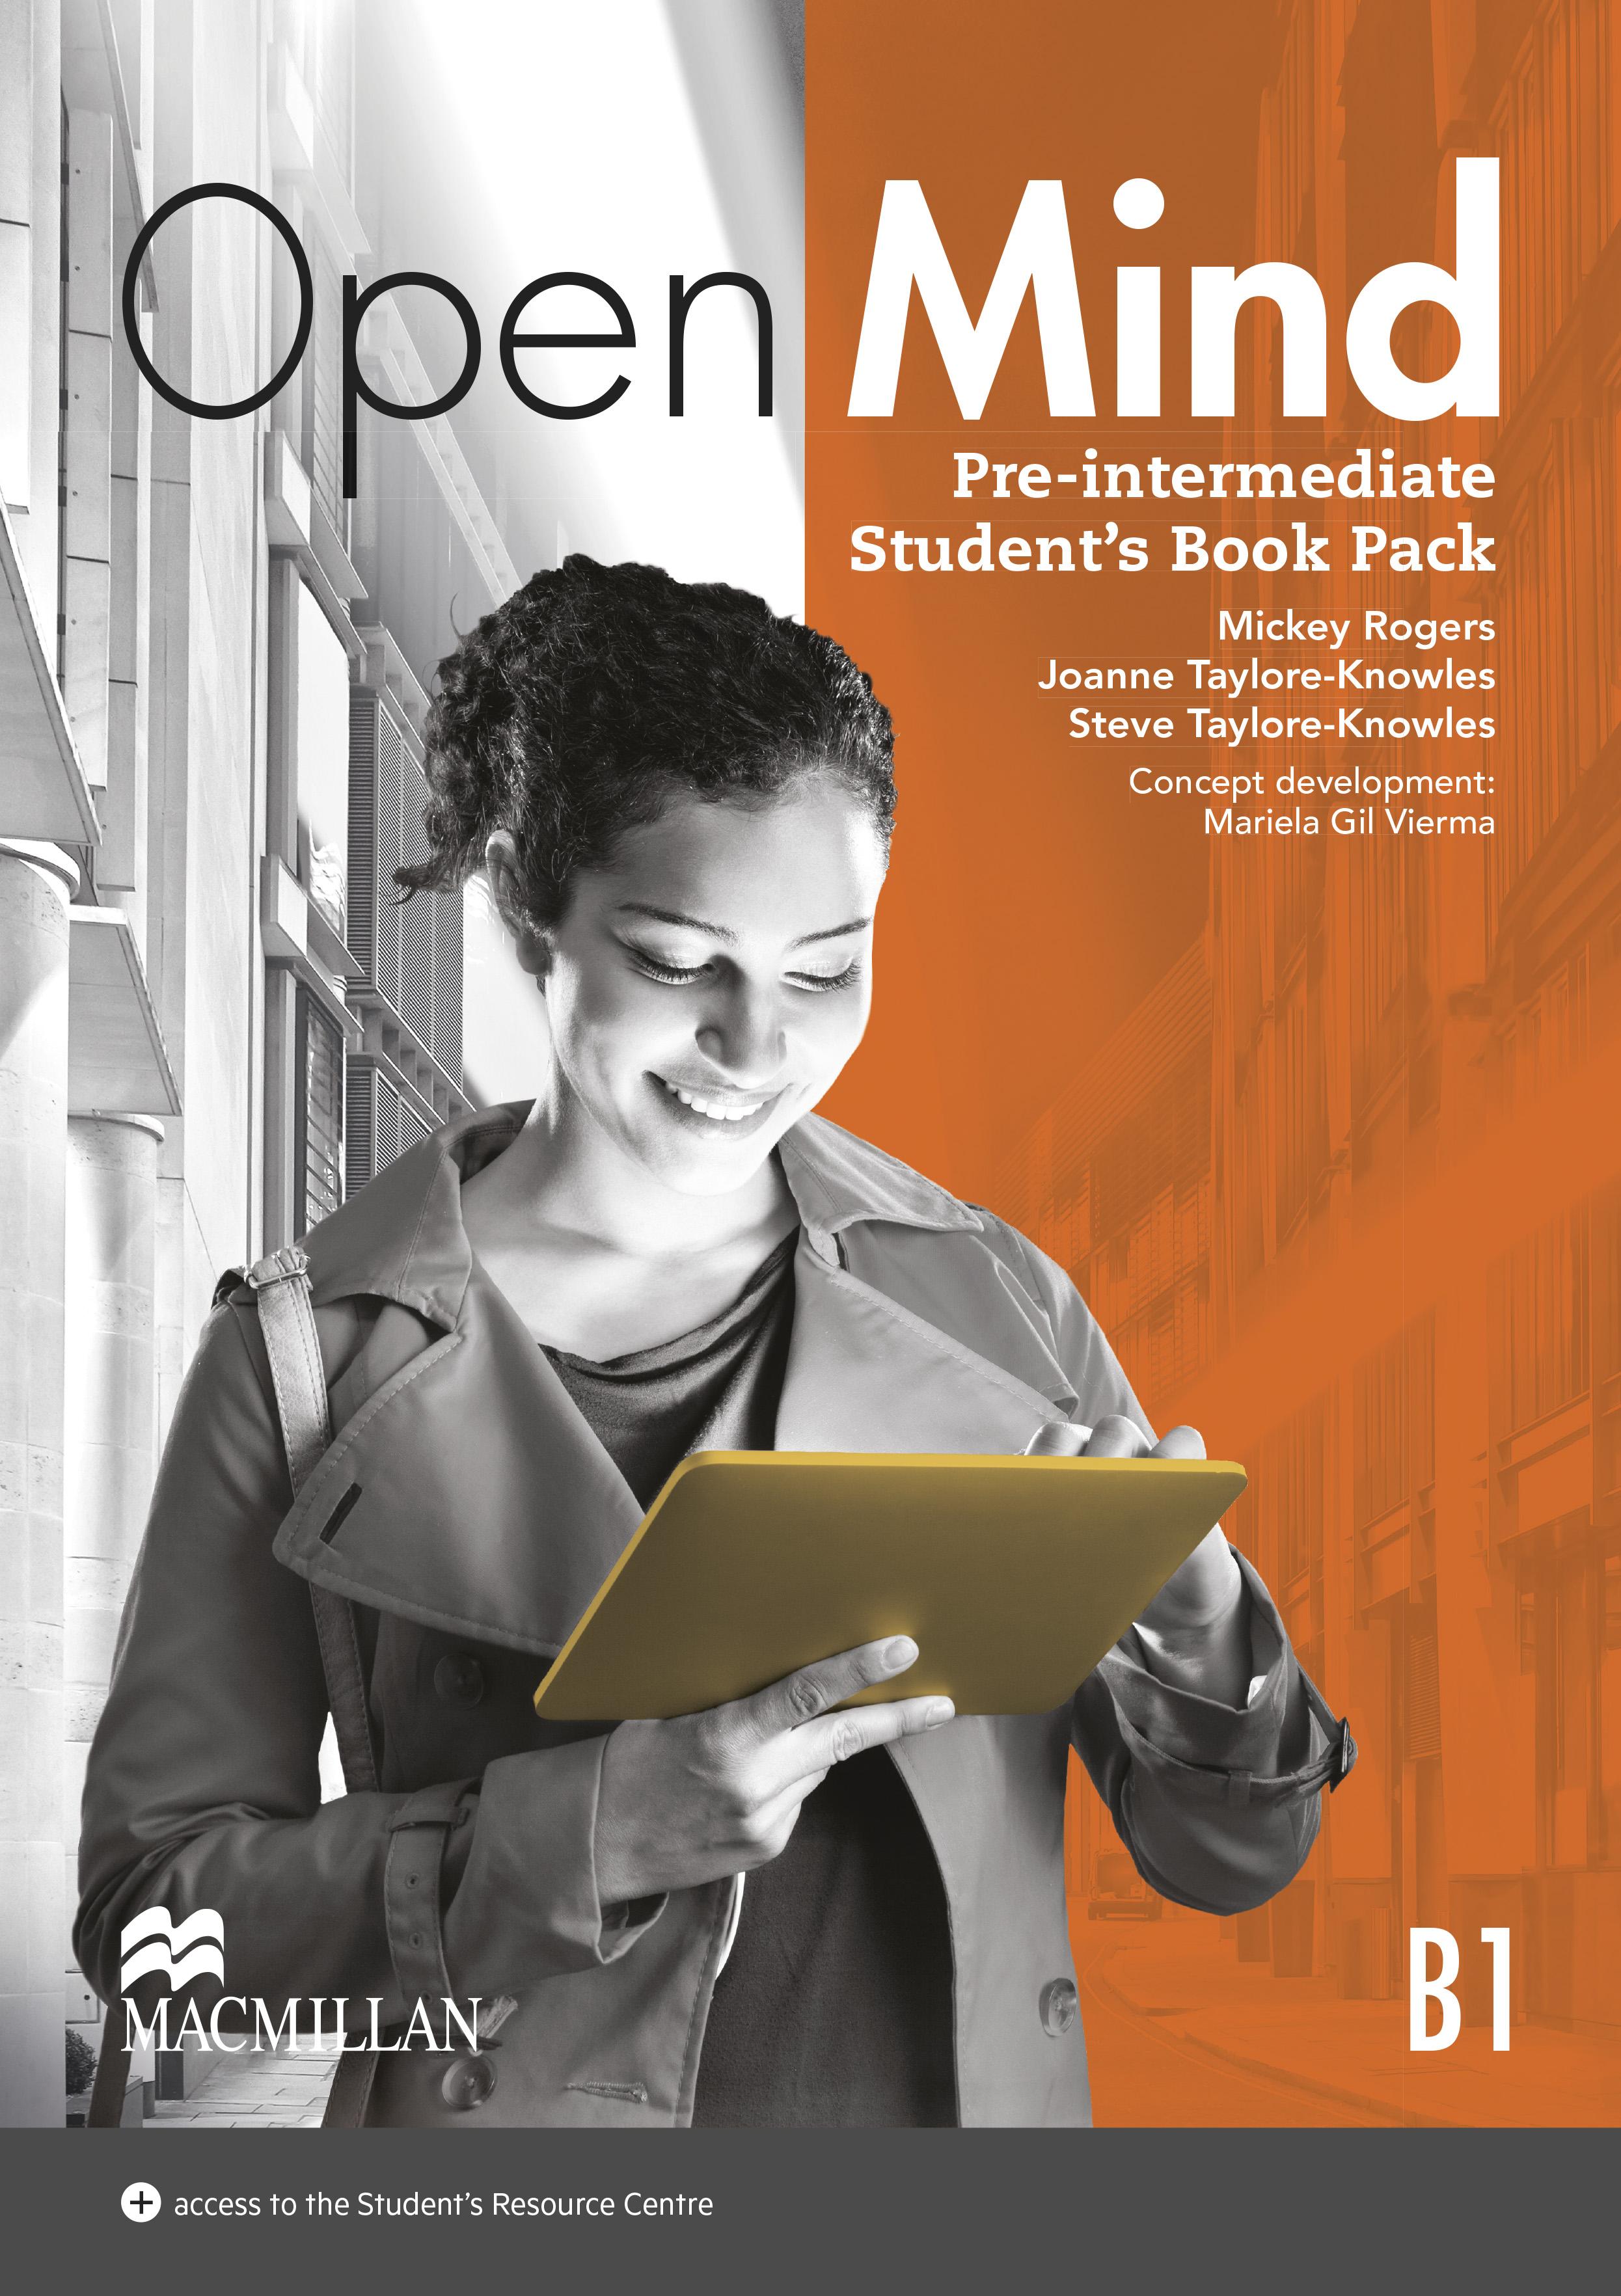 Open Mind Pre-Intermediate Student